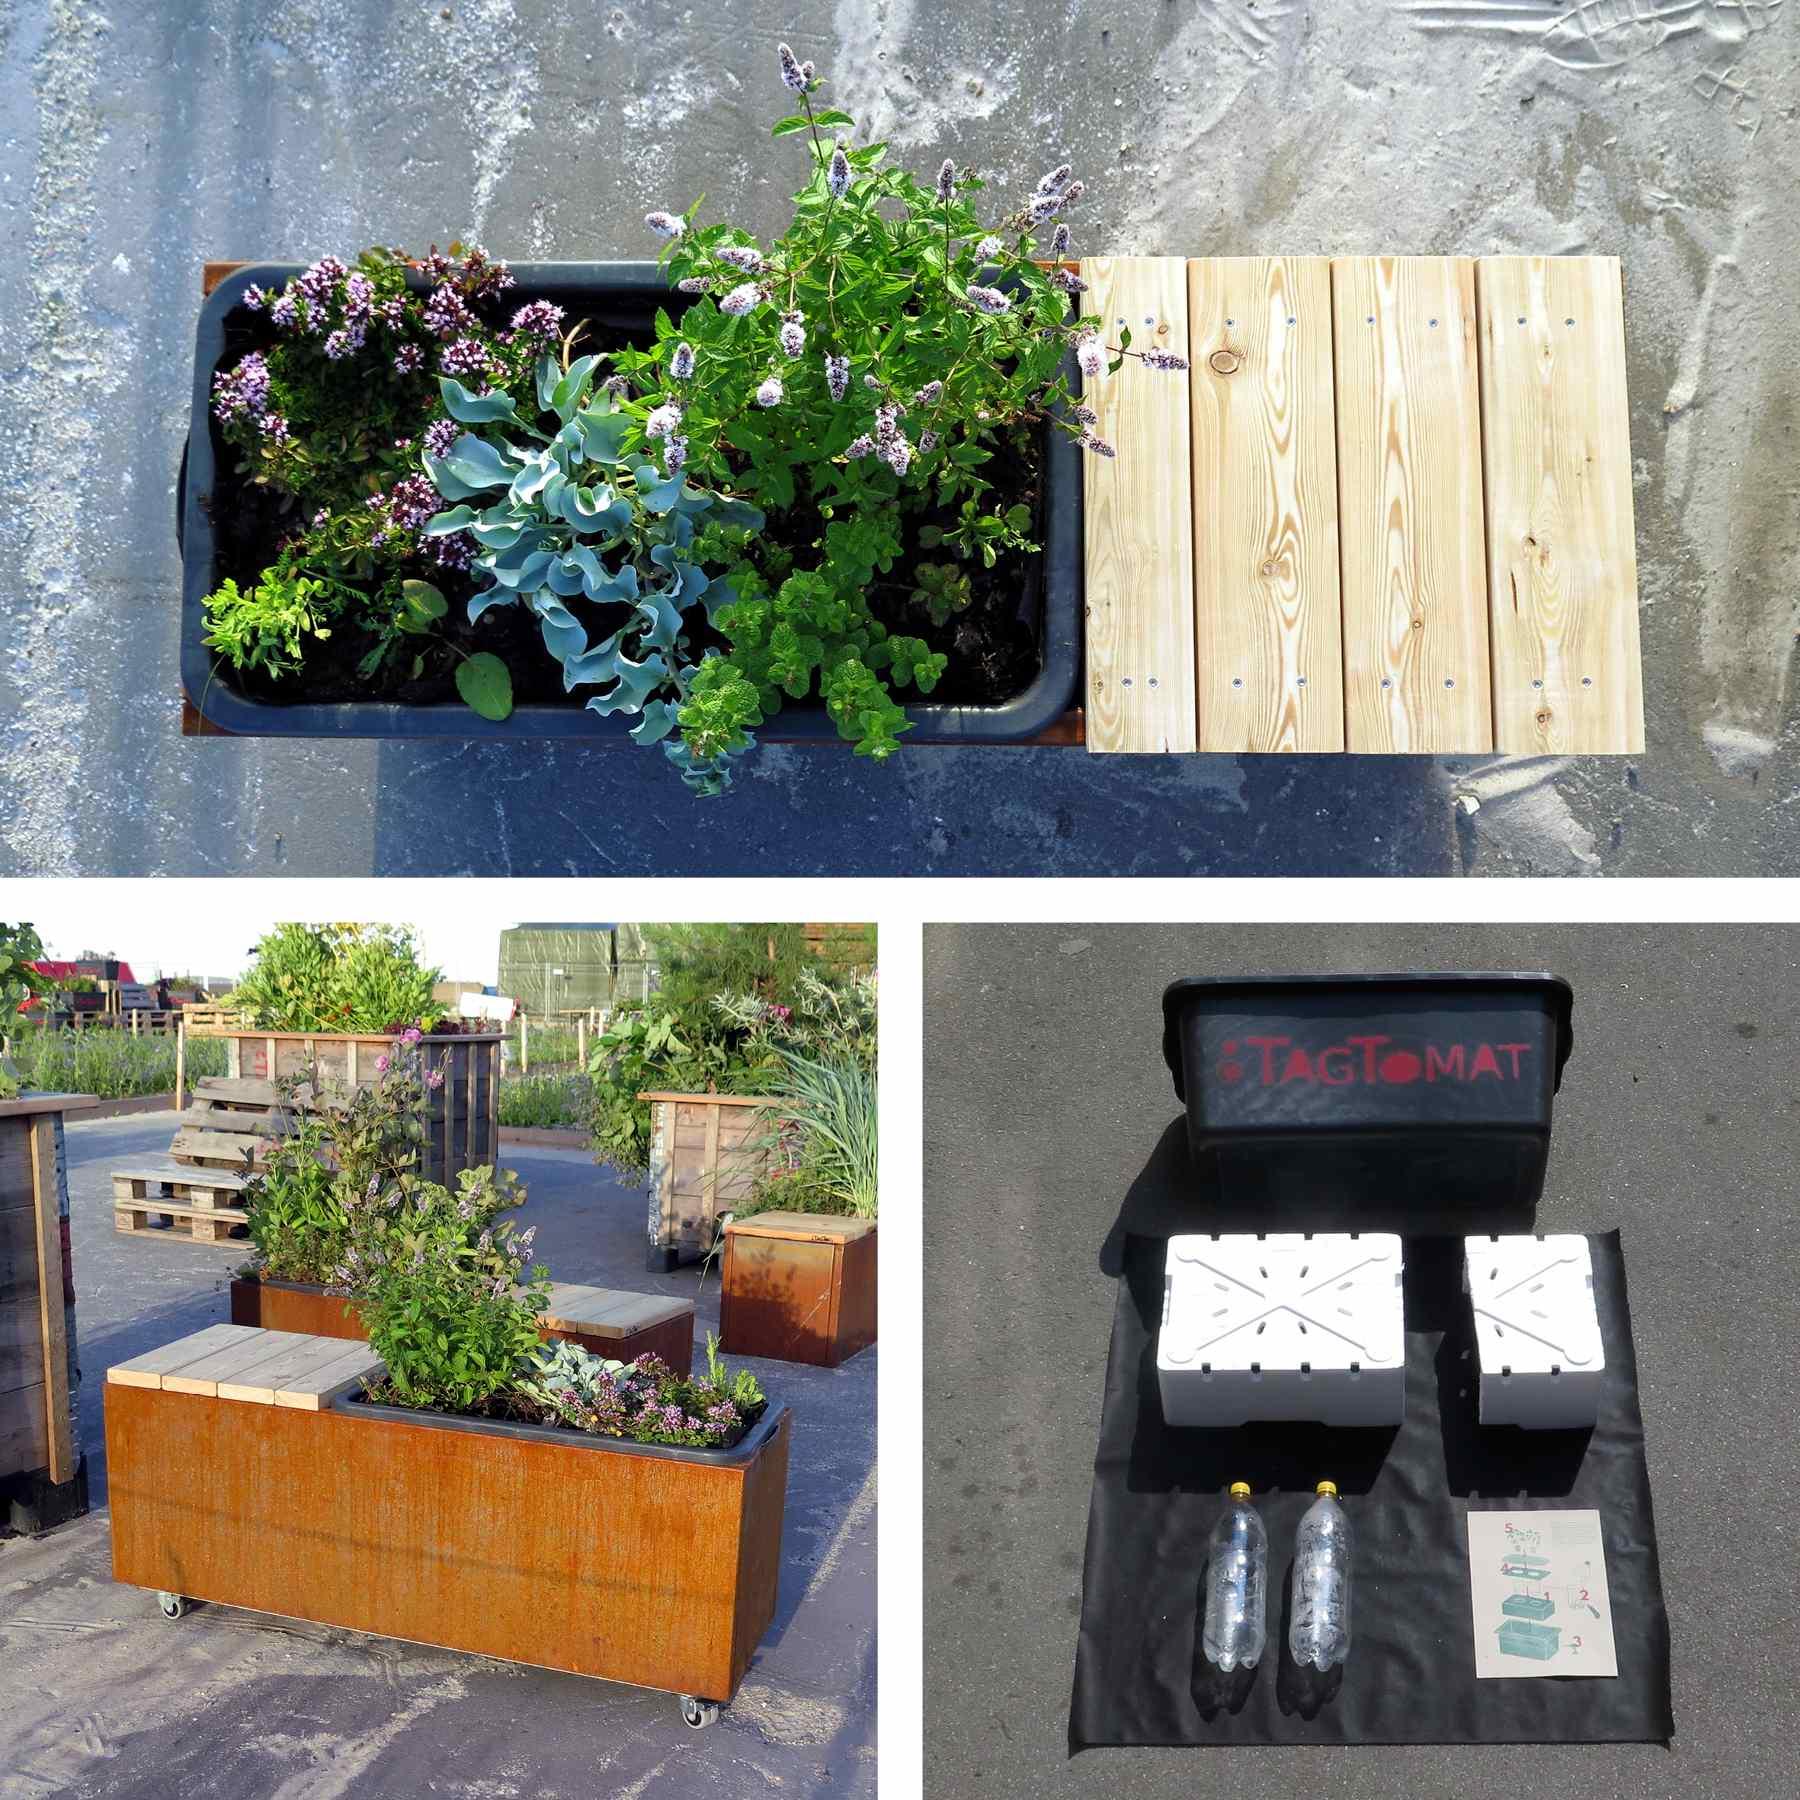 Plantekasser - med eller uden selvvanding - TagTomat